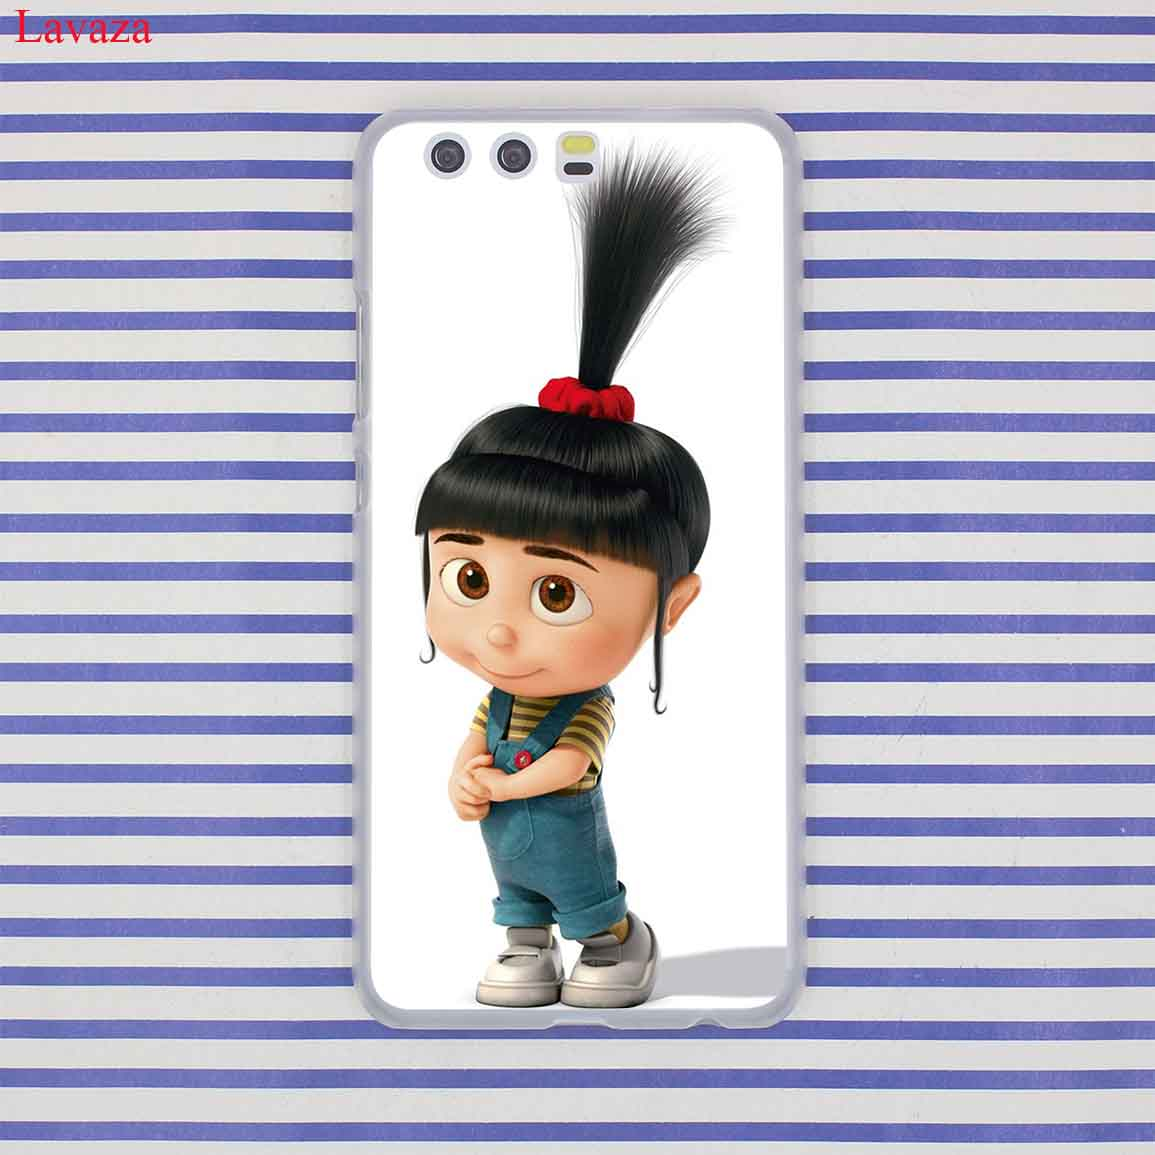 Lavaza Minions Minion My Unicorn Agnes Case for Huawei P20 P10 P9 Plus P8 Lite Mini 2015 2016 2017 P Smart Mate 9 10 Lite Pro